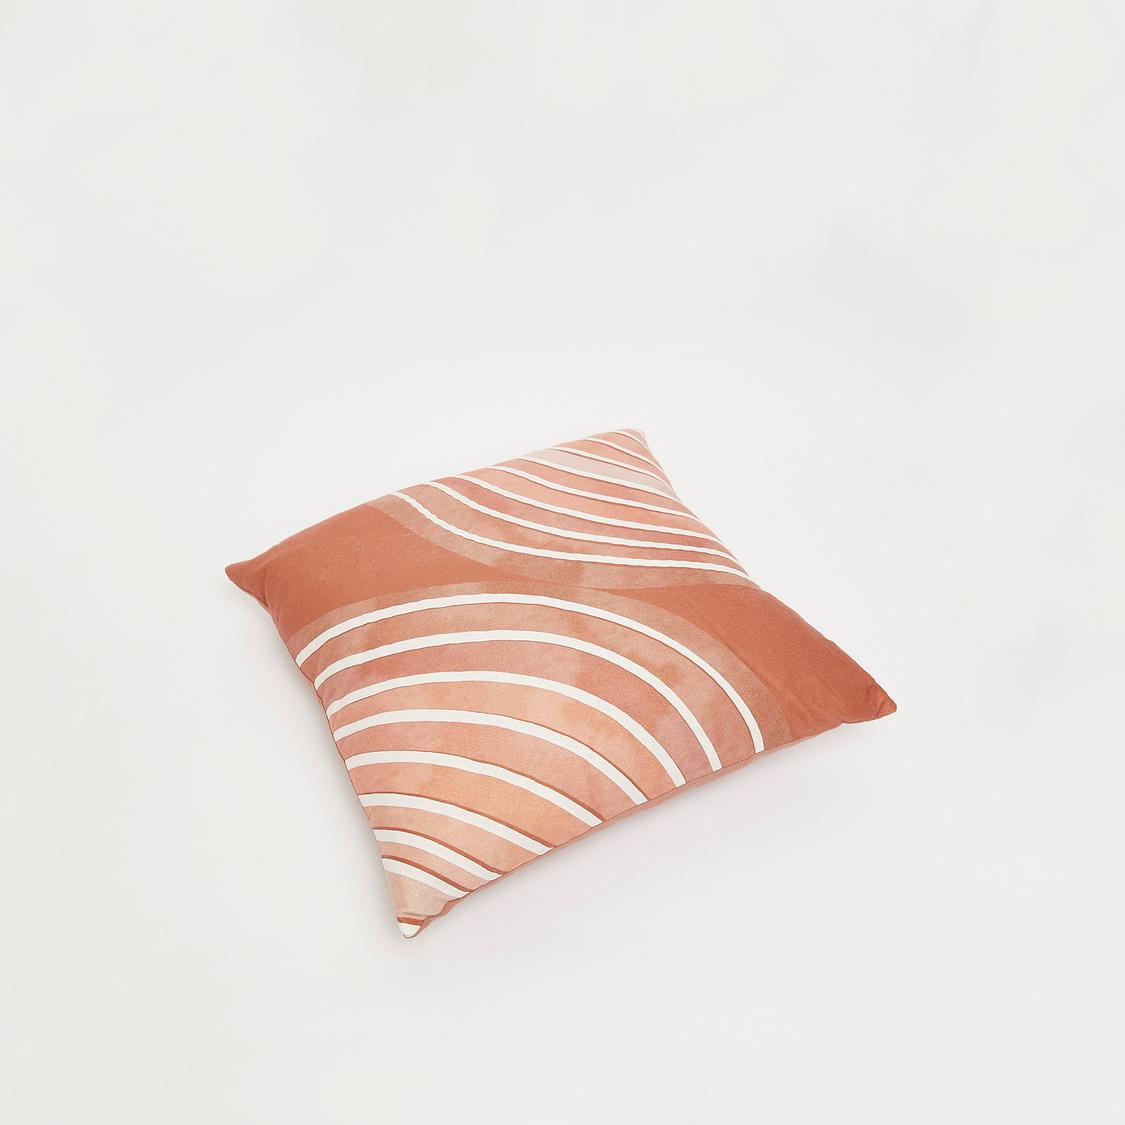 Textured Square Cushion - 45x45 cms